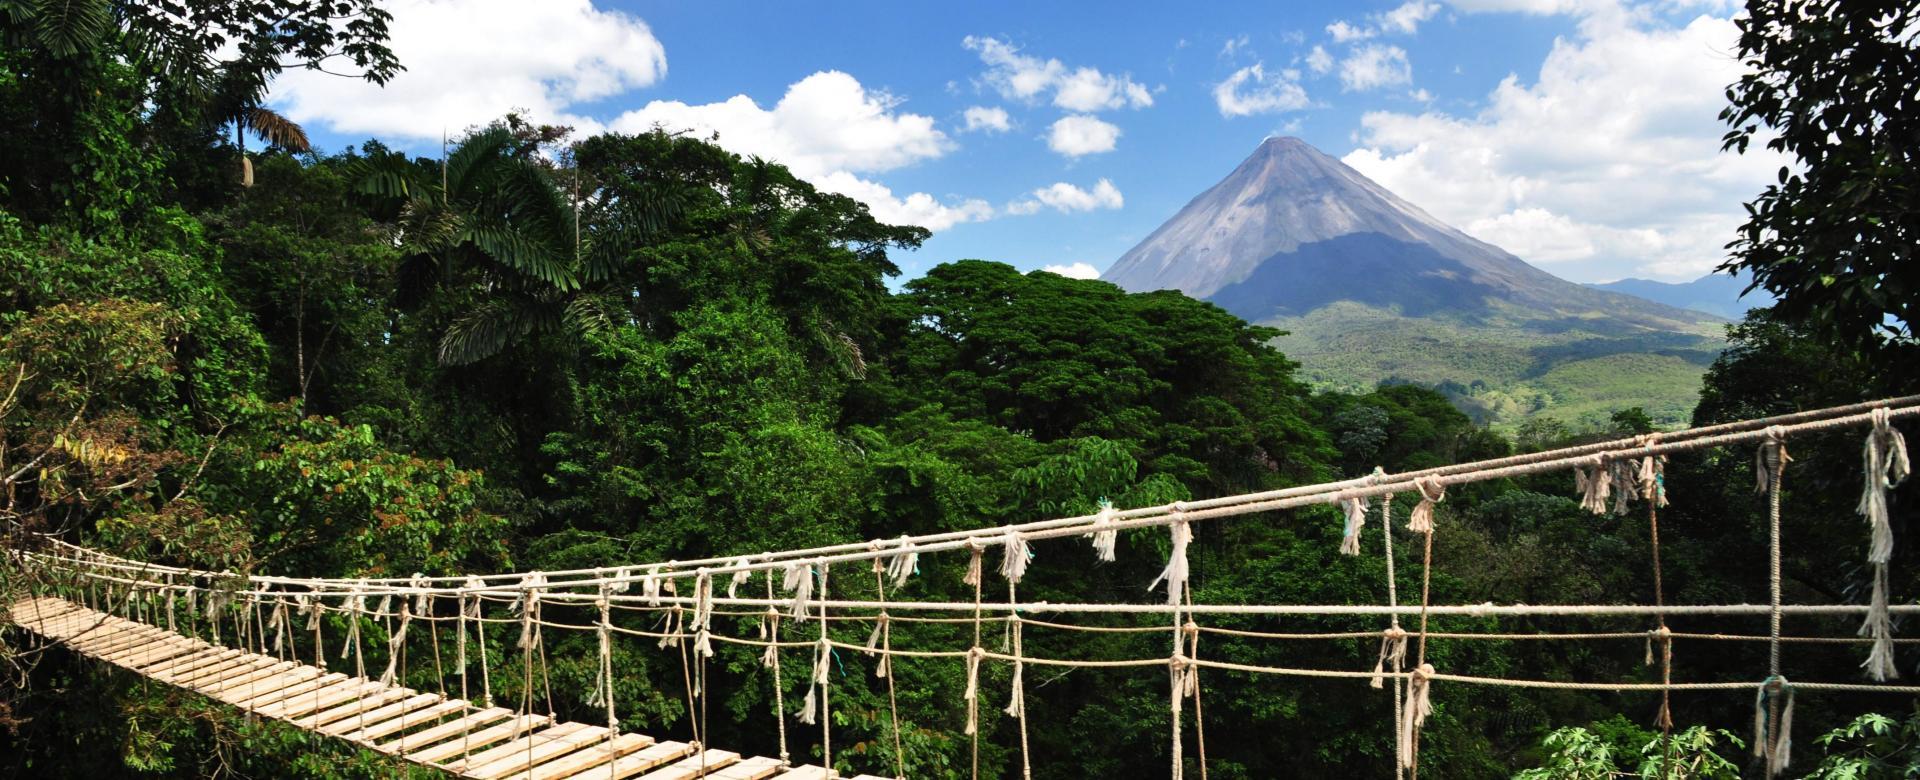 Voyage en véhicule Costa Rica : Le grand tour du costa rica